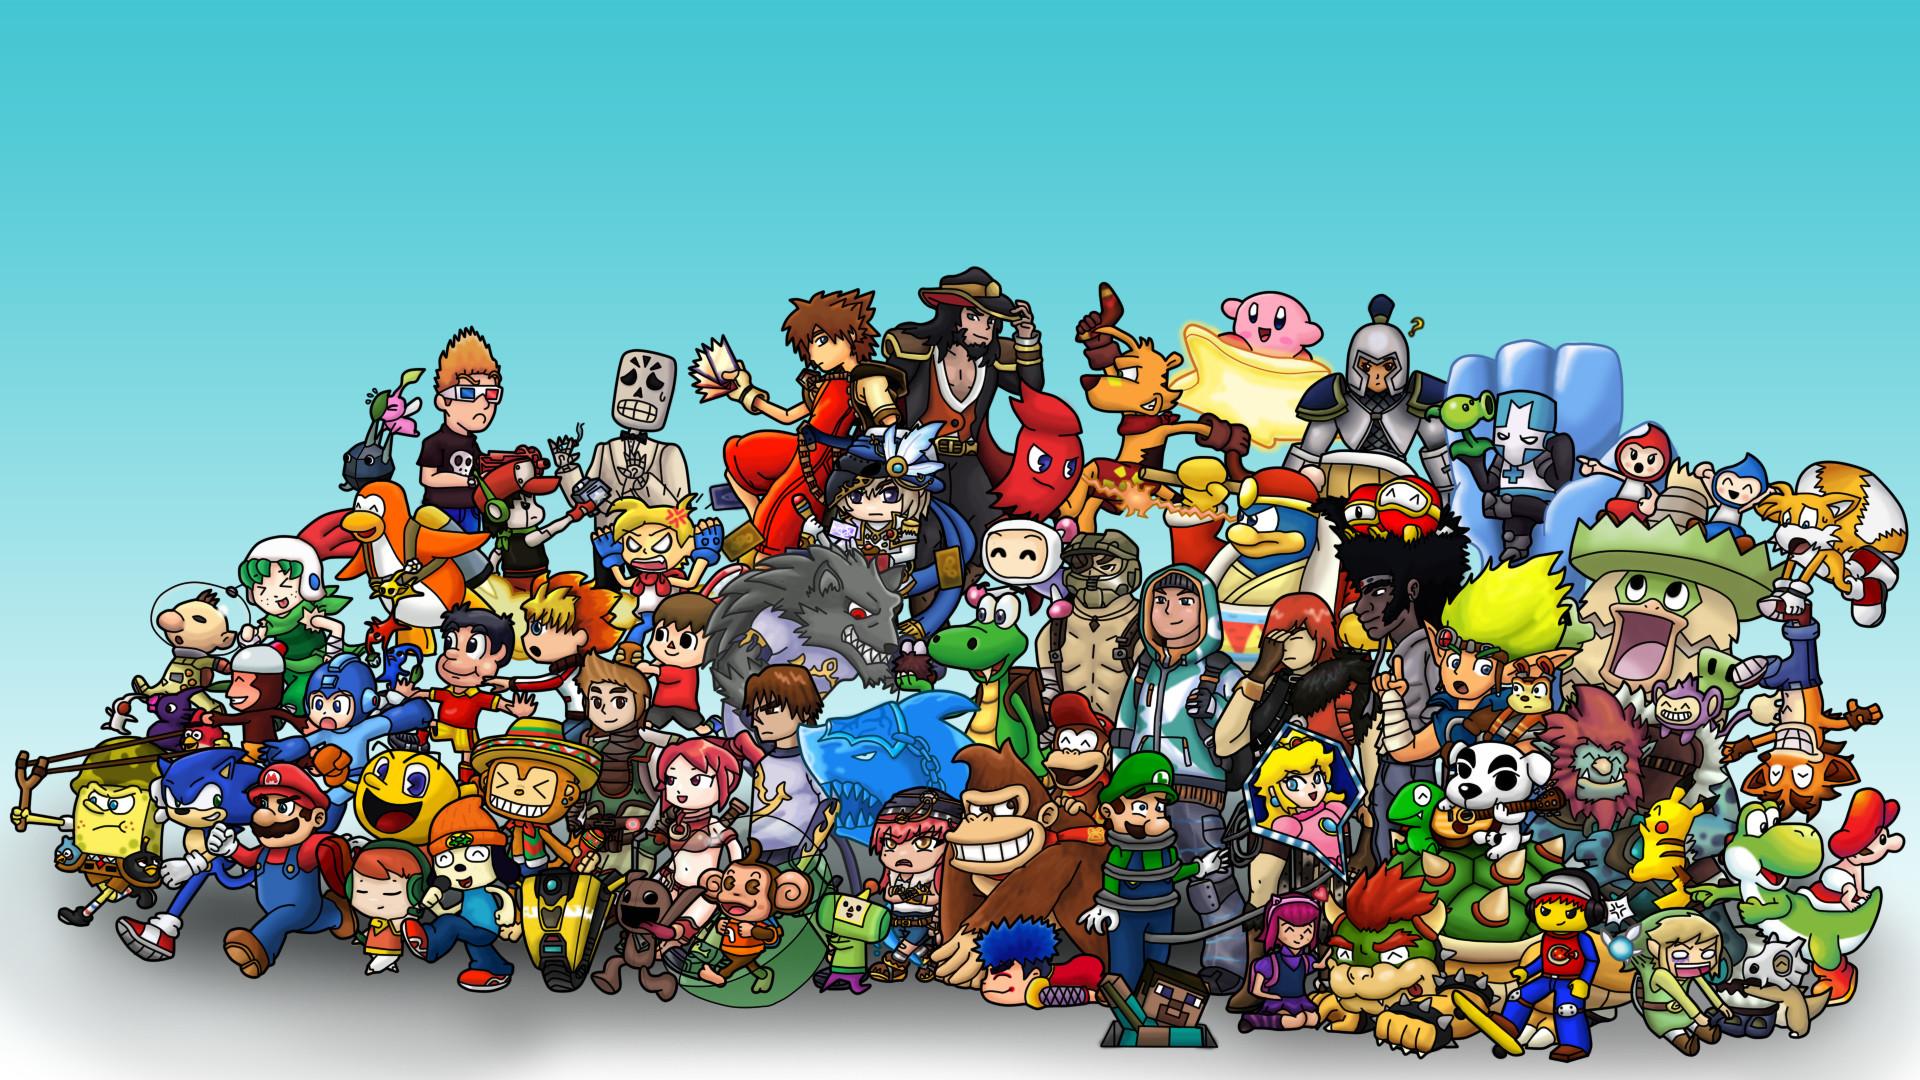 Retro Gaming Wallpaper (78+ images)